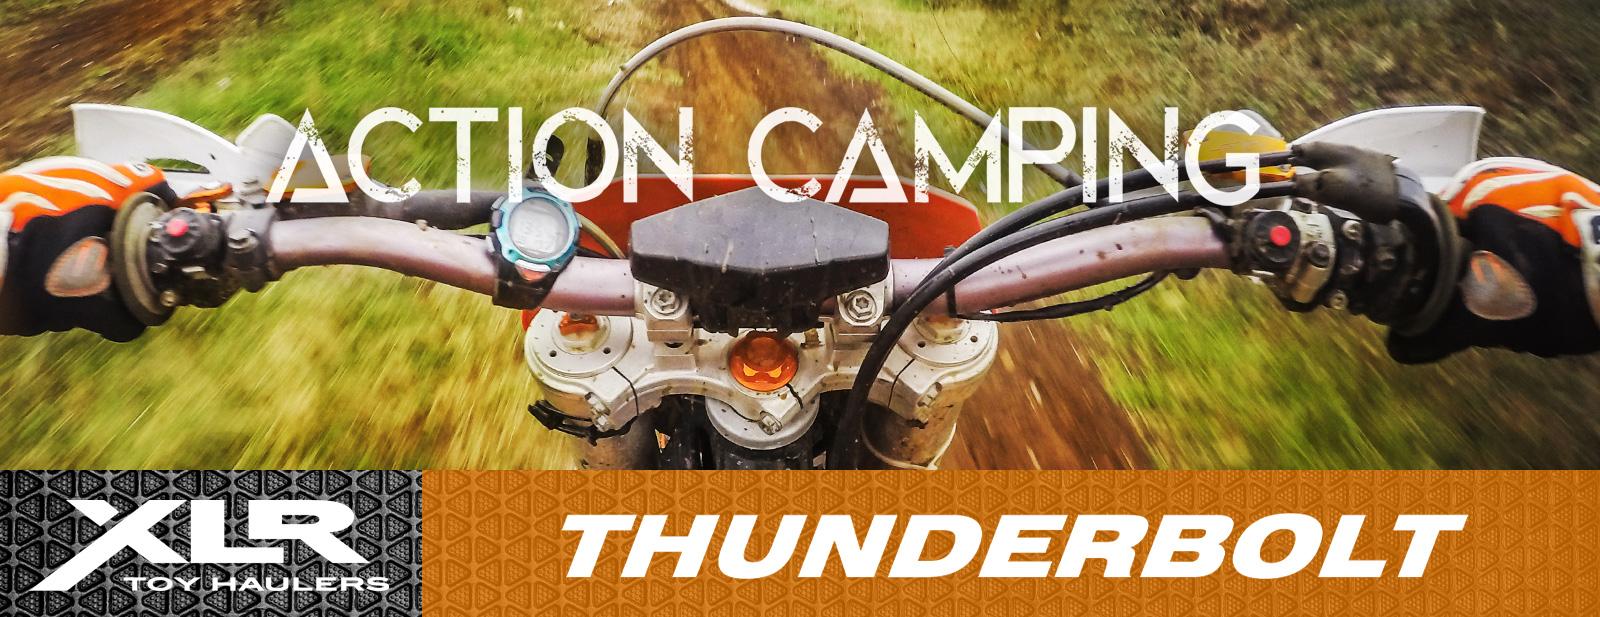 XLR Thunderbolt | Forest River RV - Manufacturer of Travel